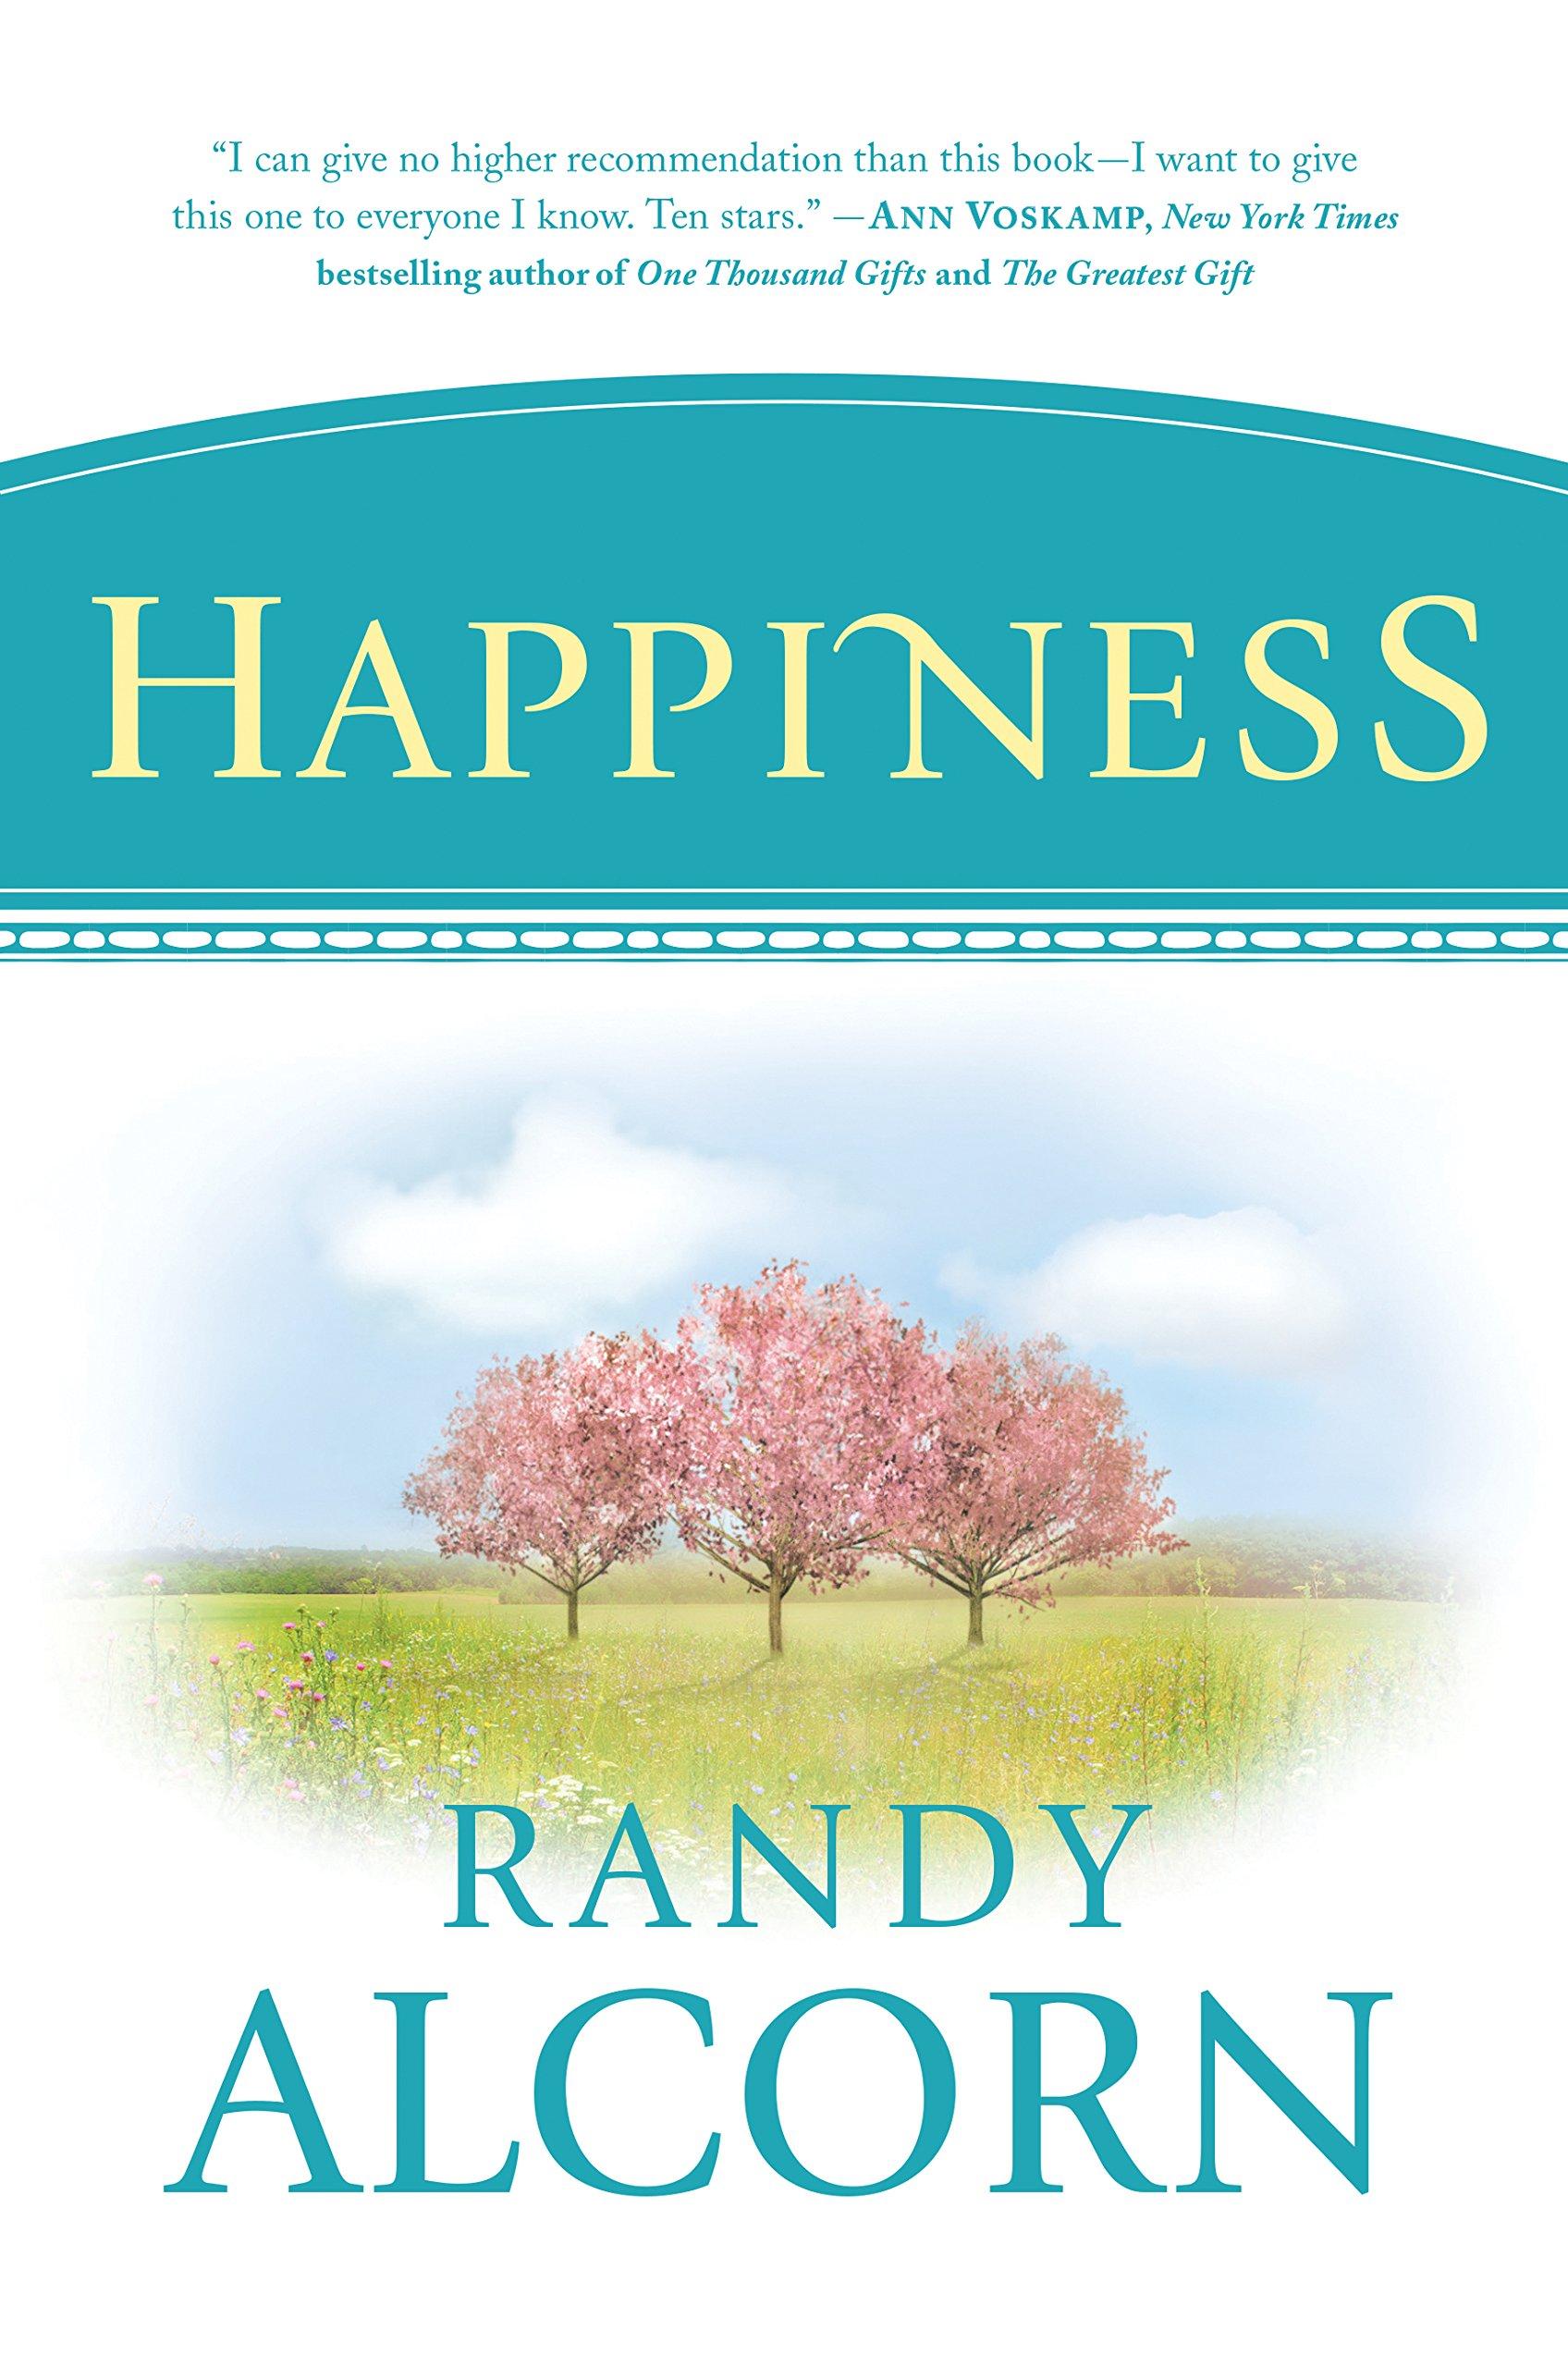 Happiness Randy Alcorn 9781414389349 Amazoncom Books